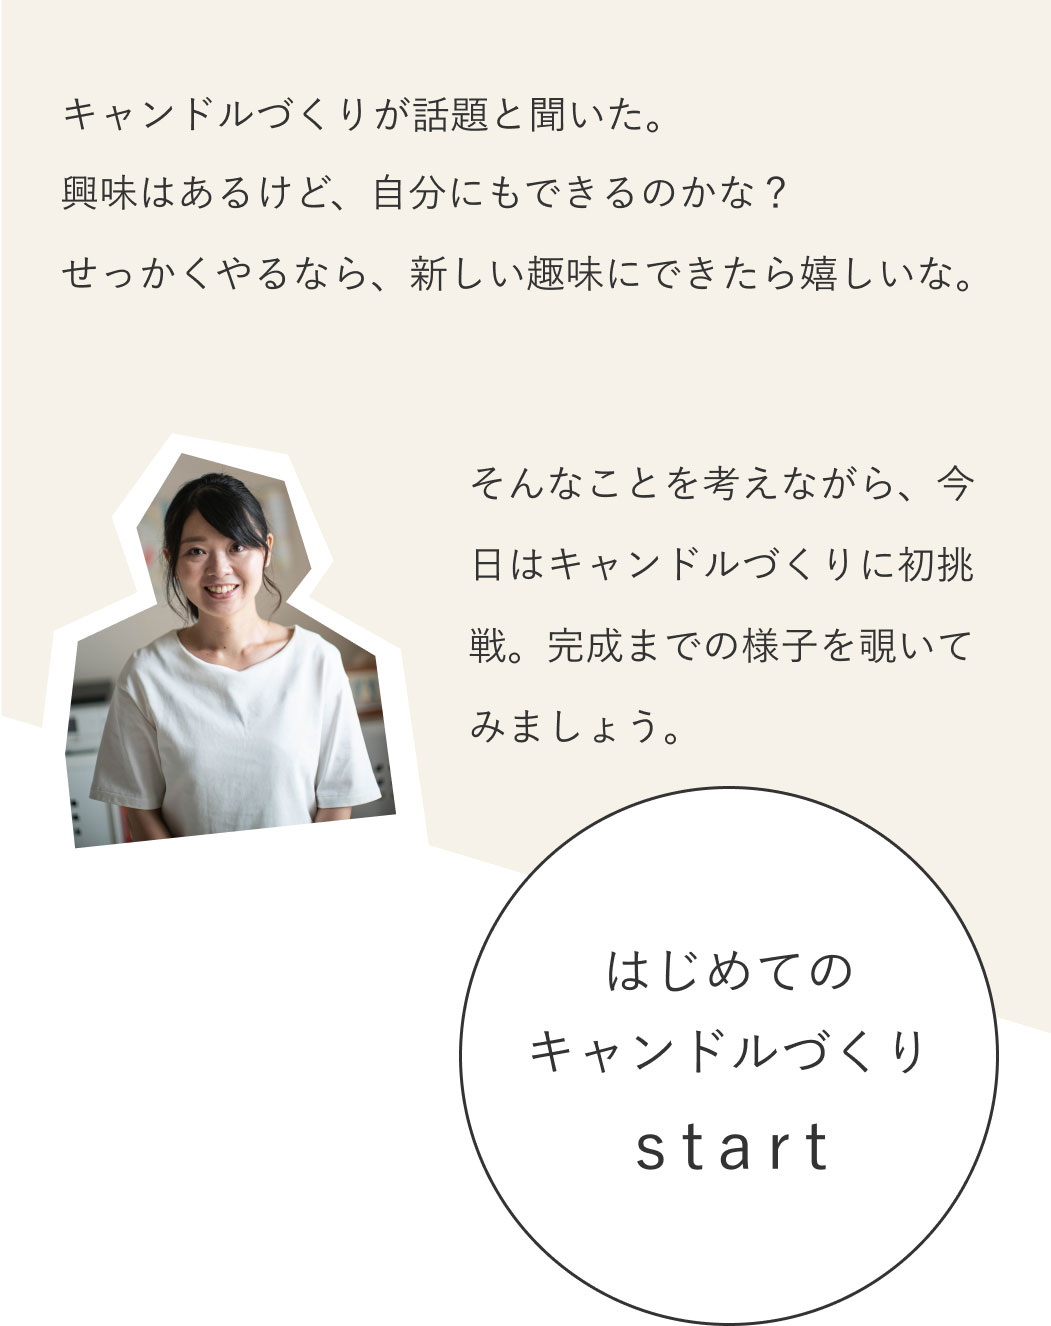 Lp story 1